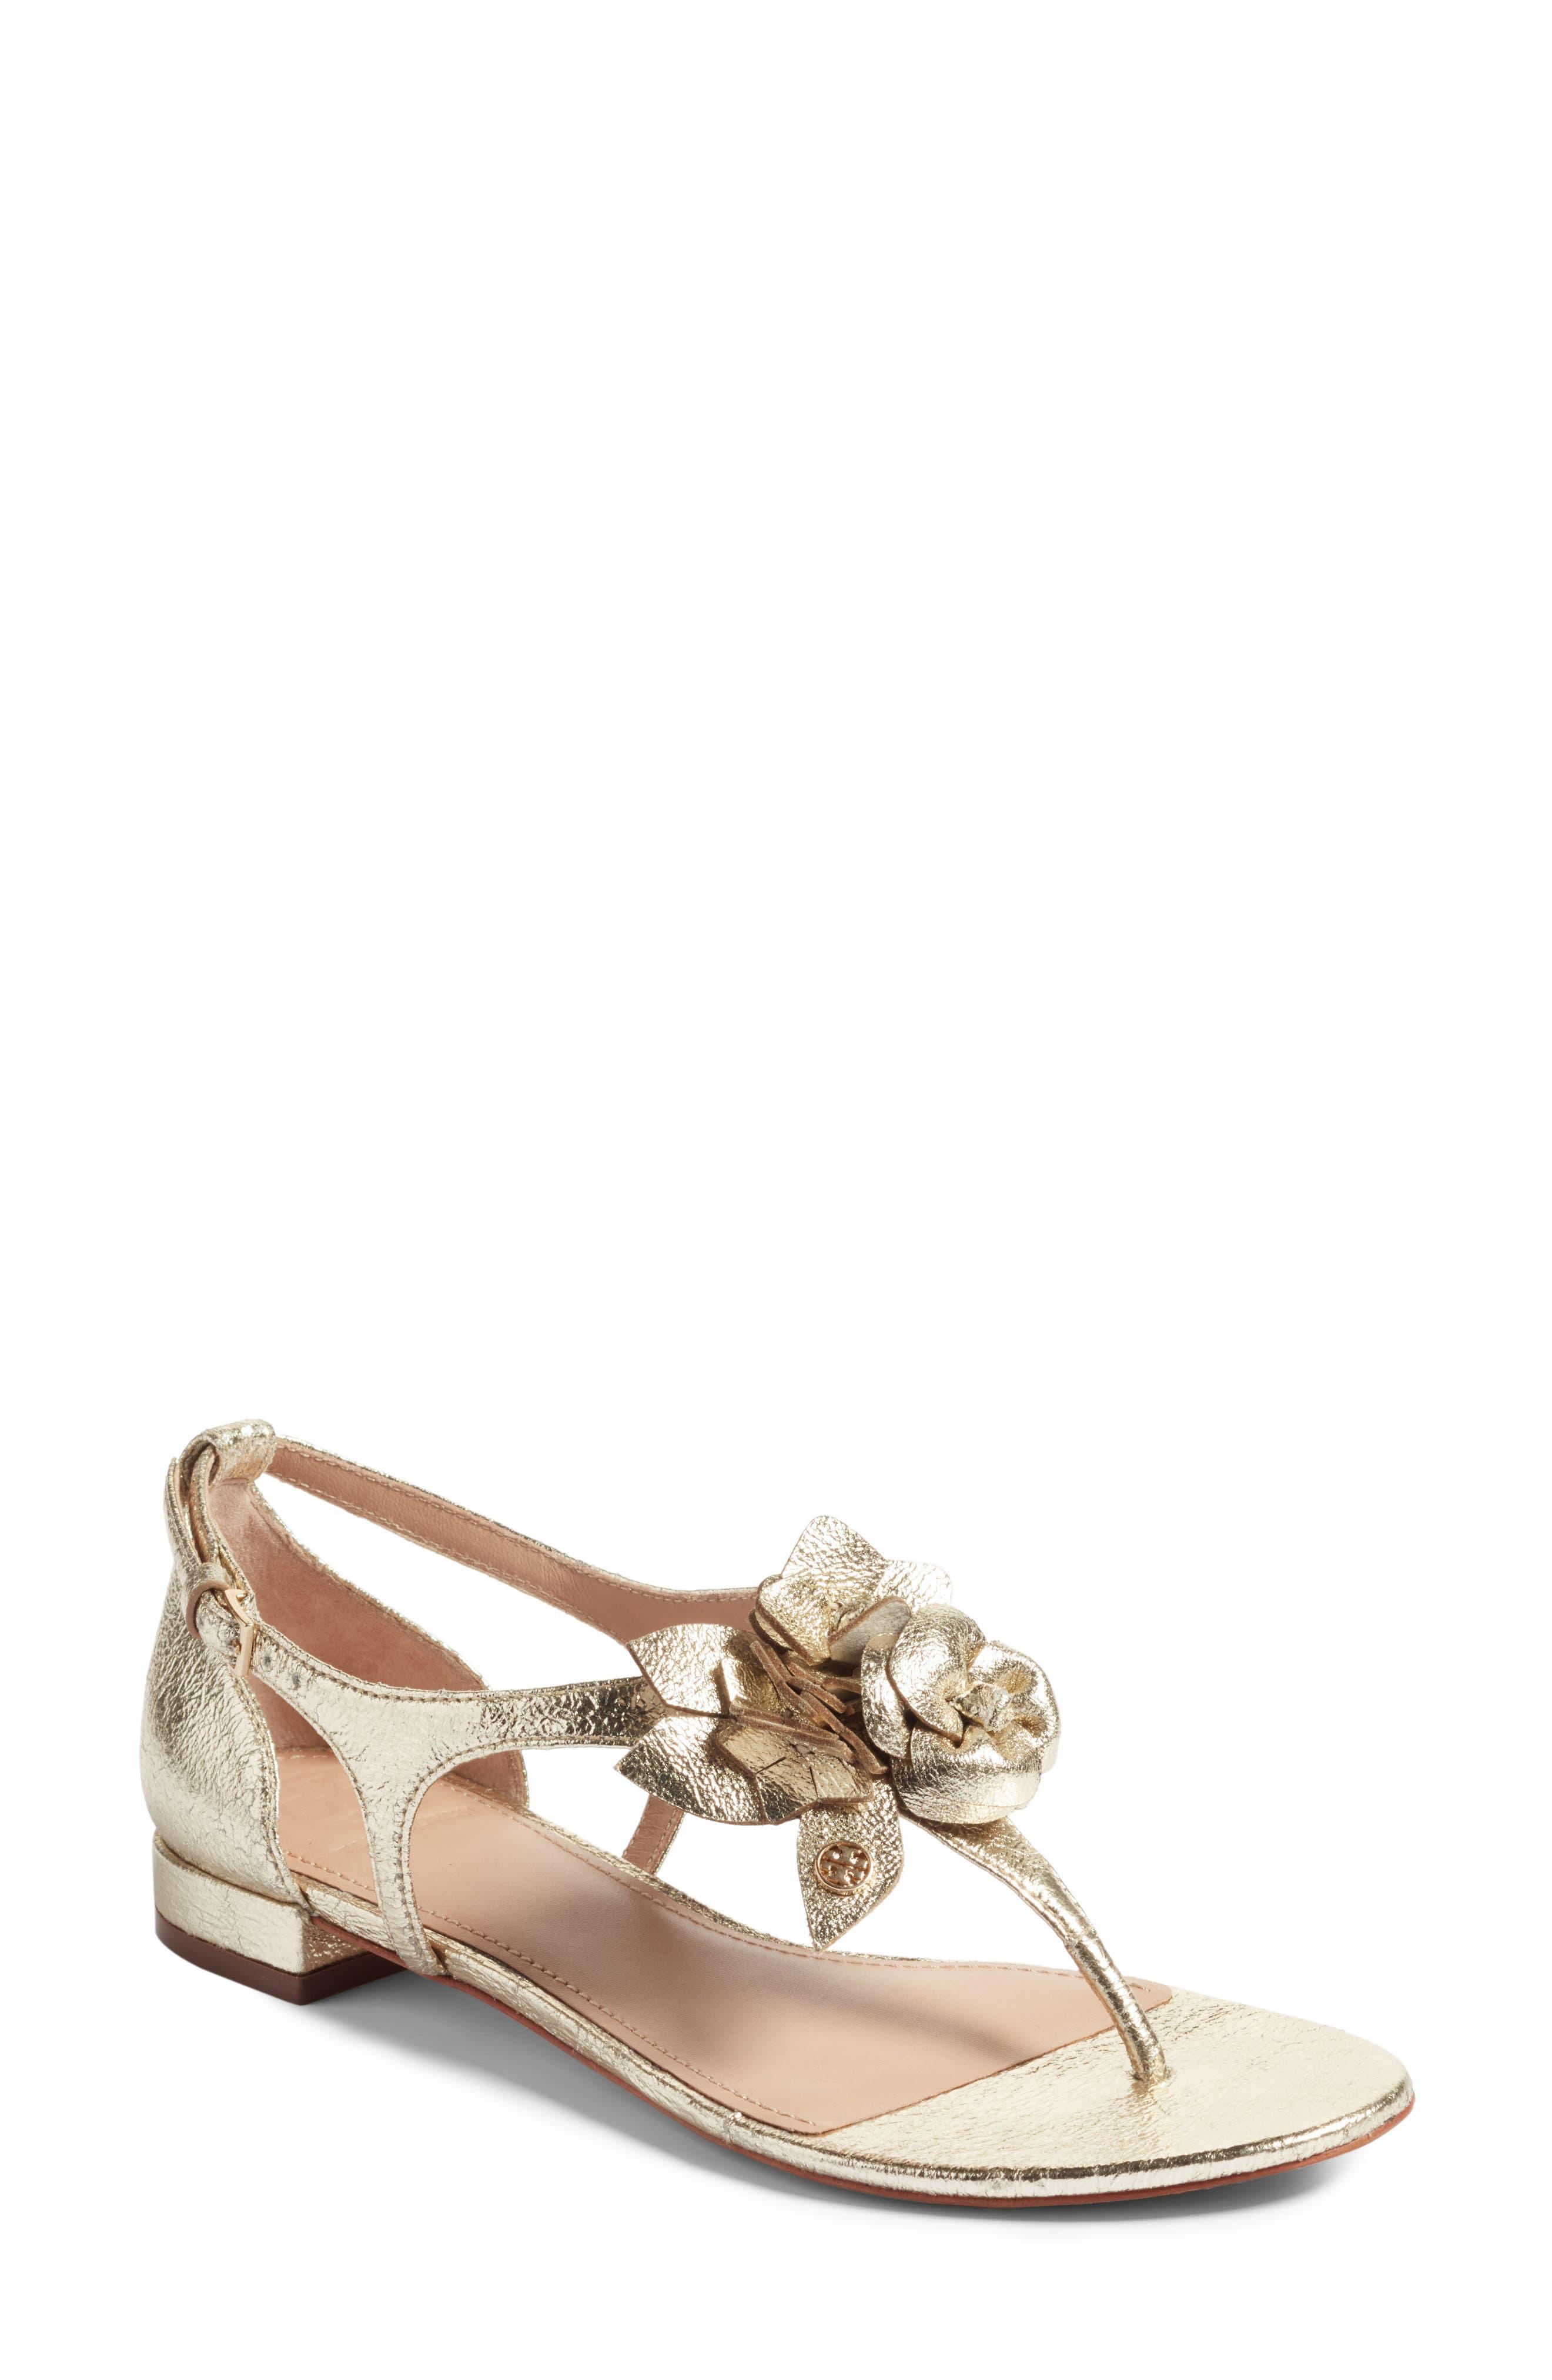 Main Image - Tory Burch Blossom Sandal (Women)